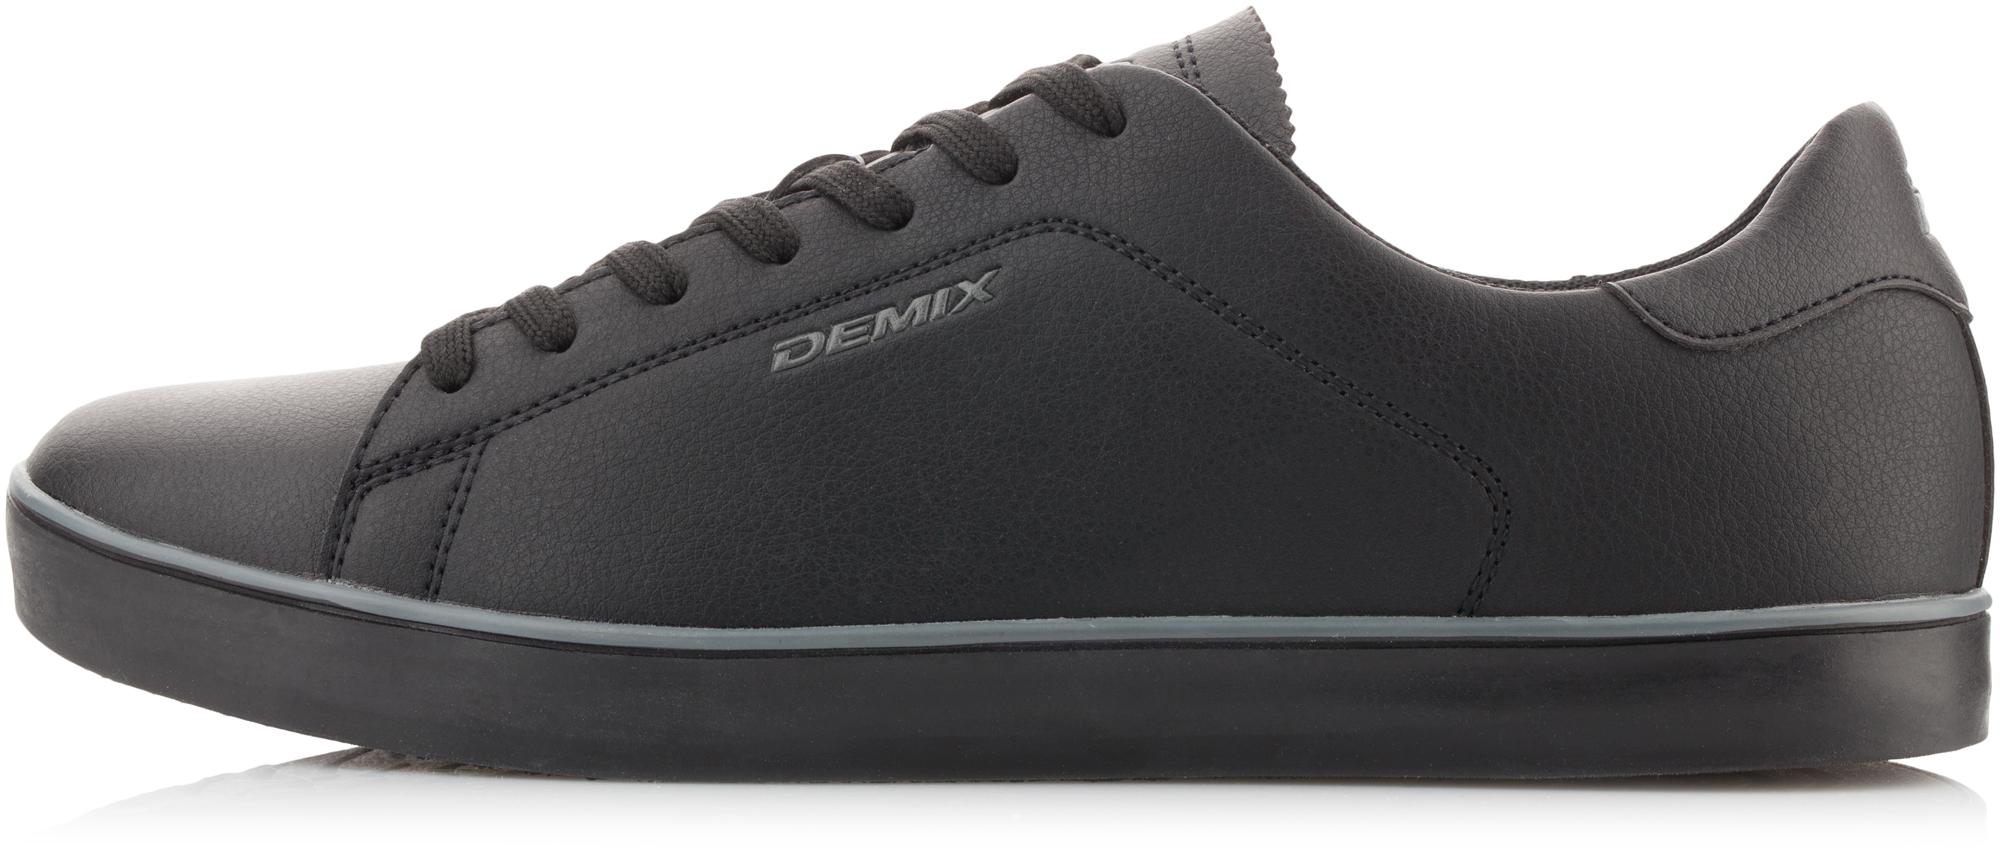 Demix Кеды мужские Demix Board брюки спортивного стиля мужские